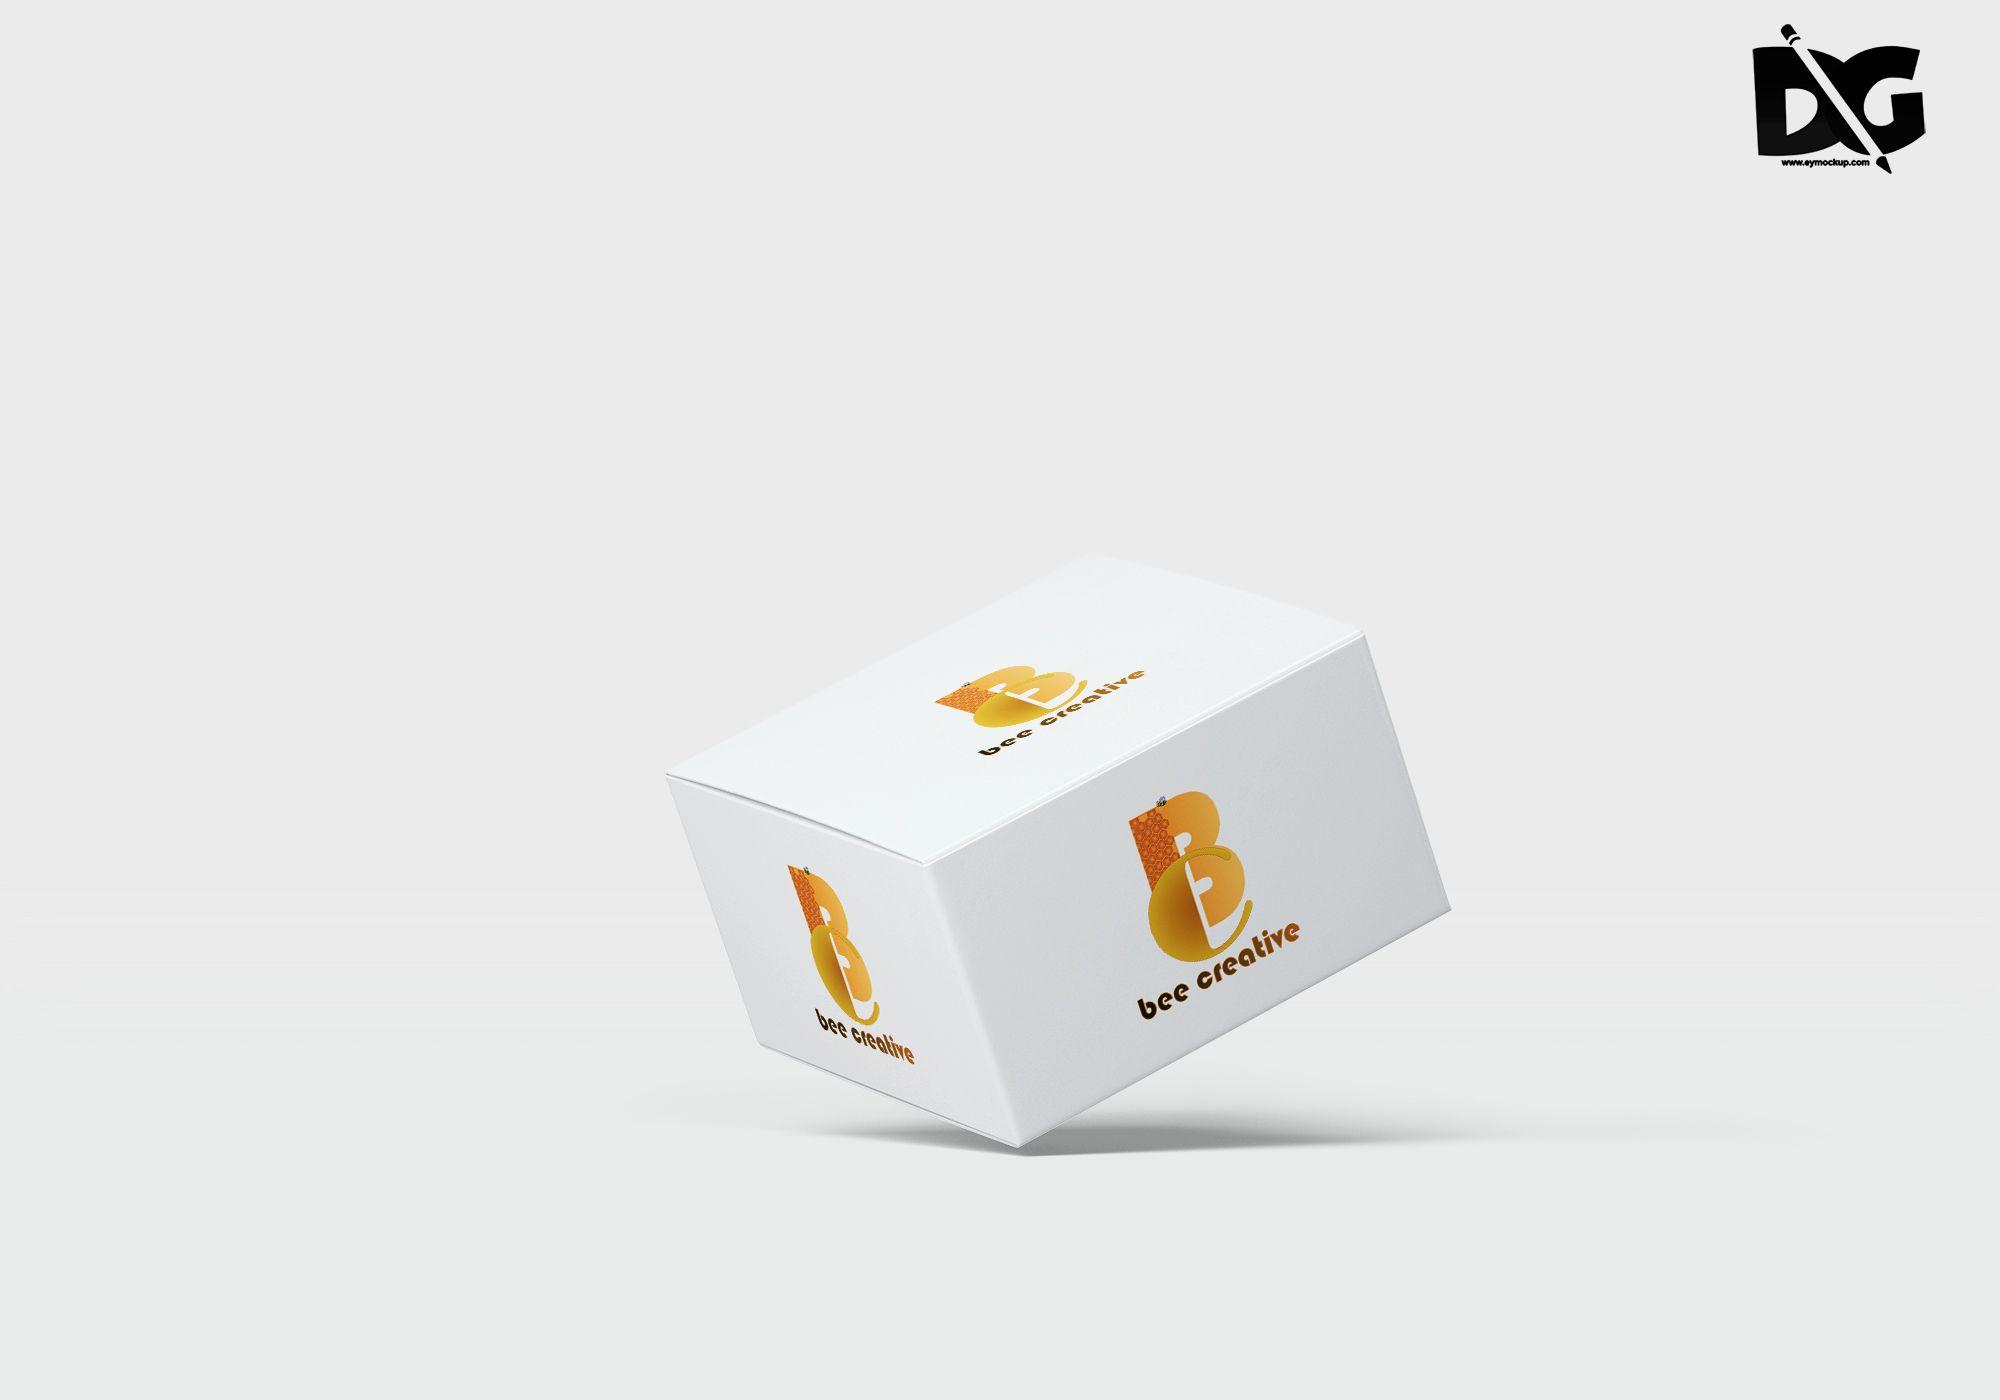 Download Open Tilt Acrylic Box Mockup Box Mockup Acrylic Box Free Mockup